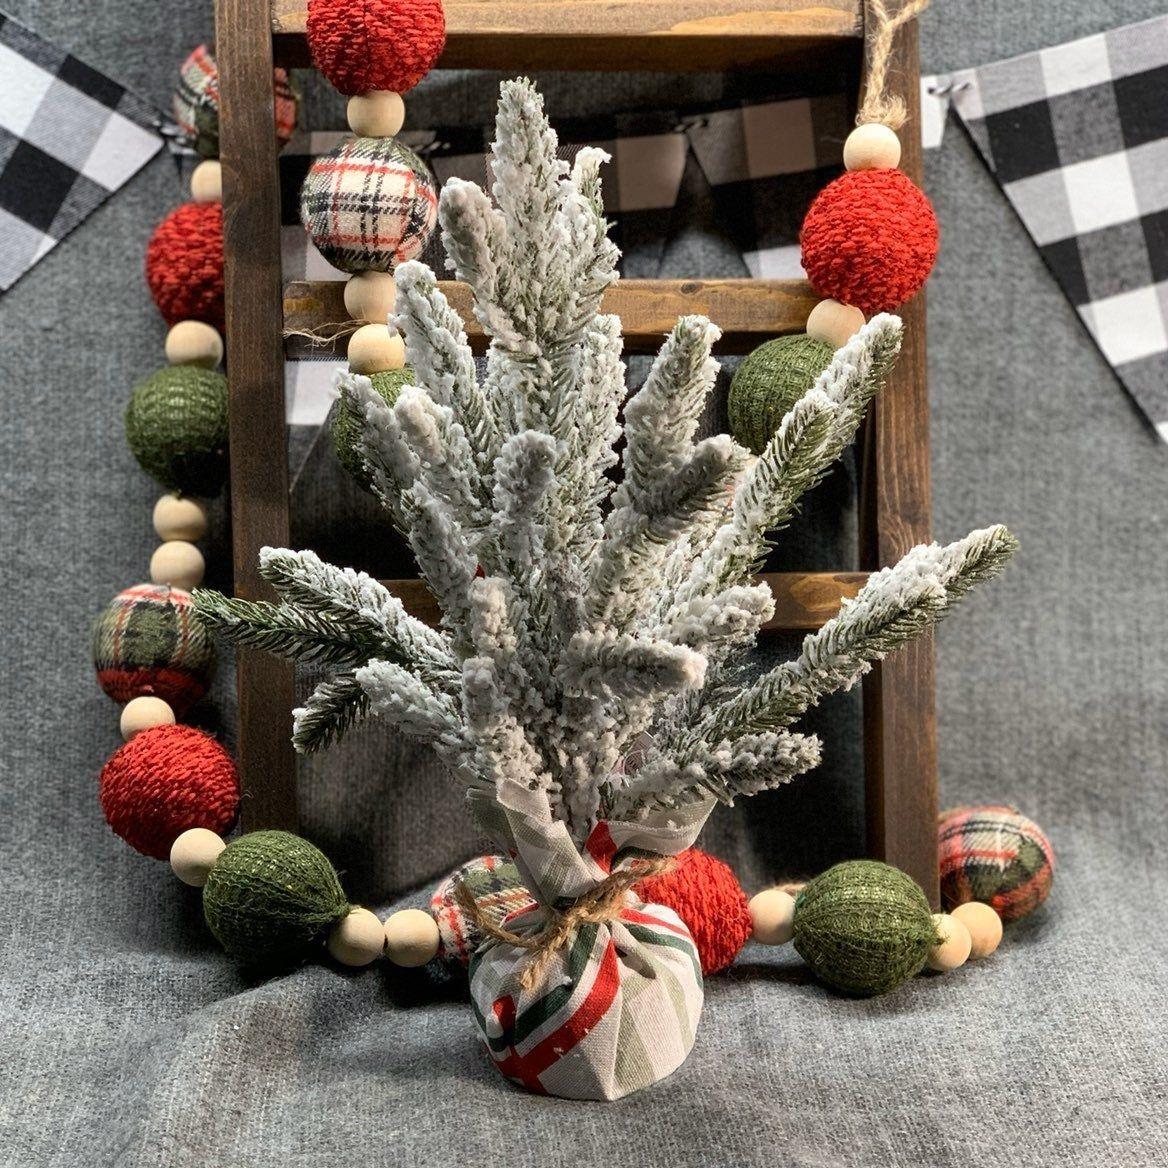 New Target Dollar Spot Christmas 2019 flocked mini Pine